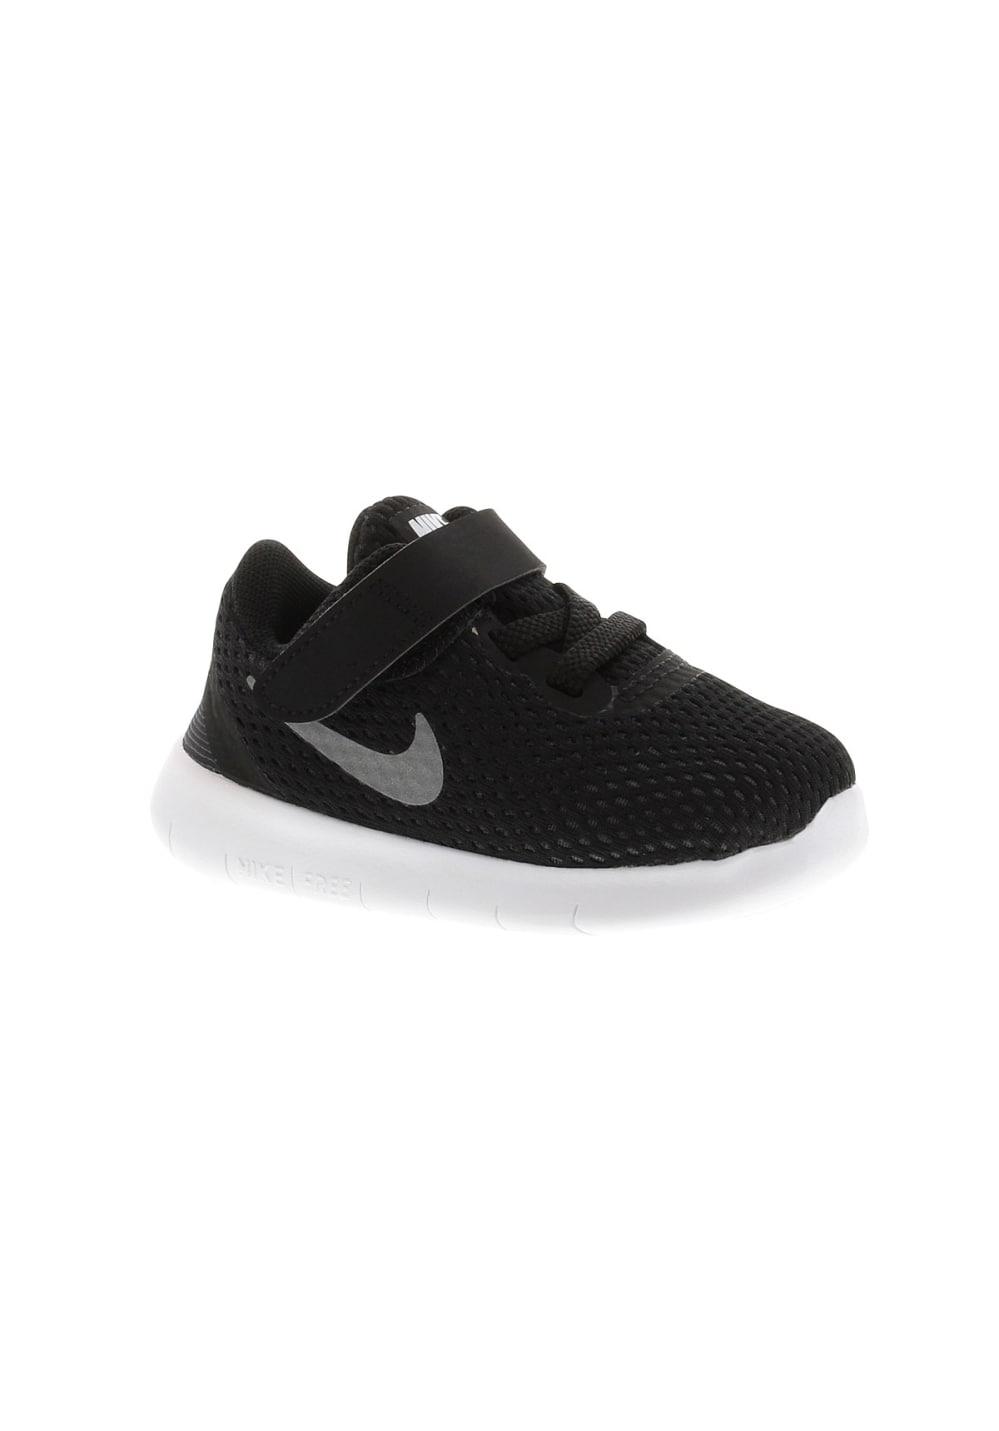 Running Noir Free Run Chaussures Nike Tdv j5ALqRc34